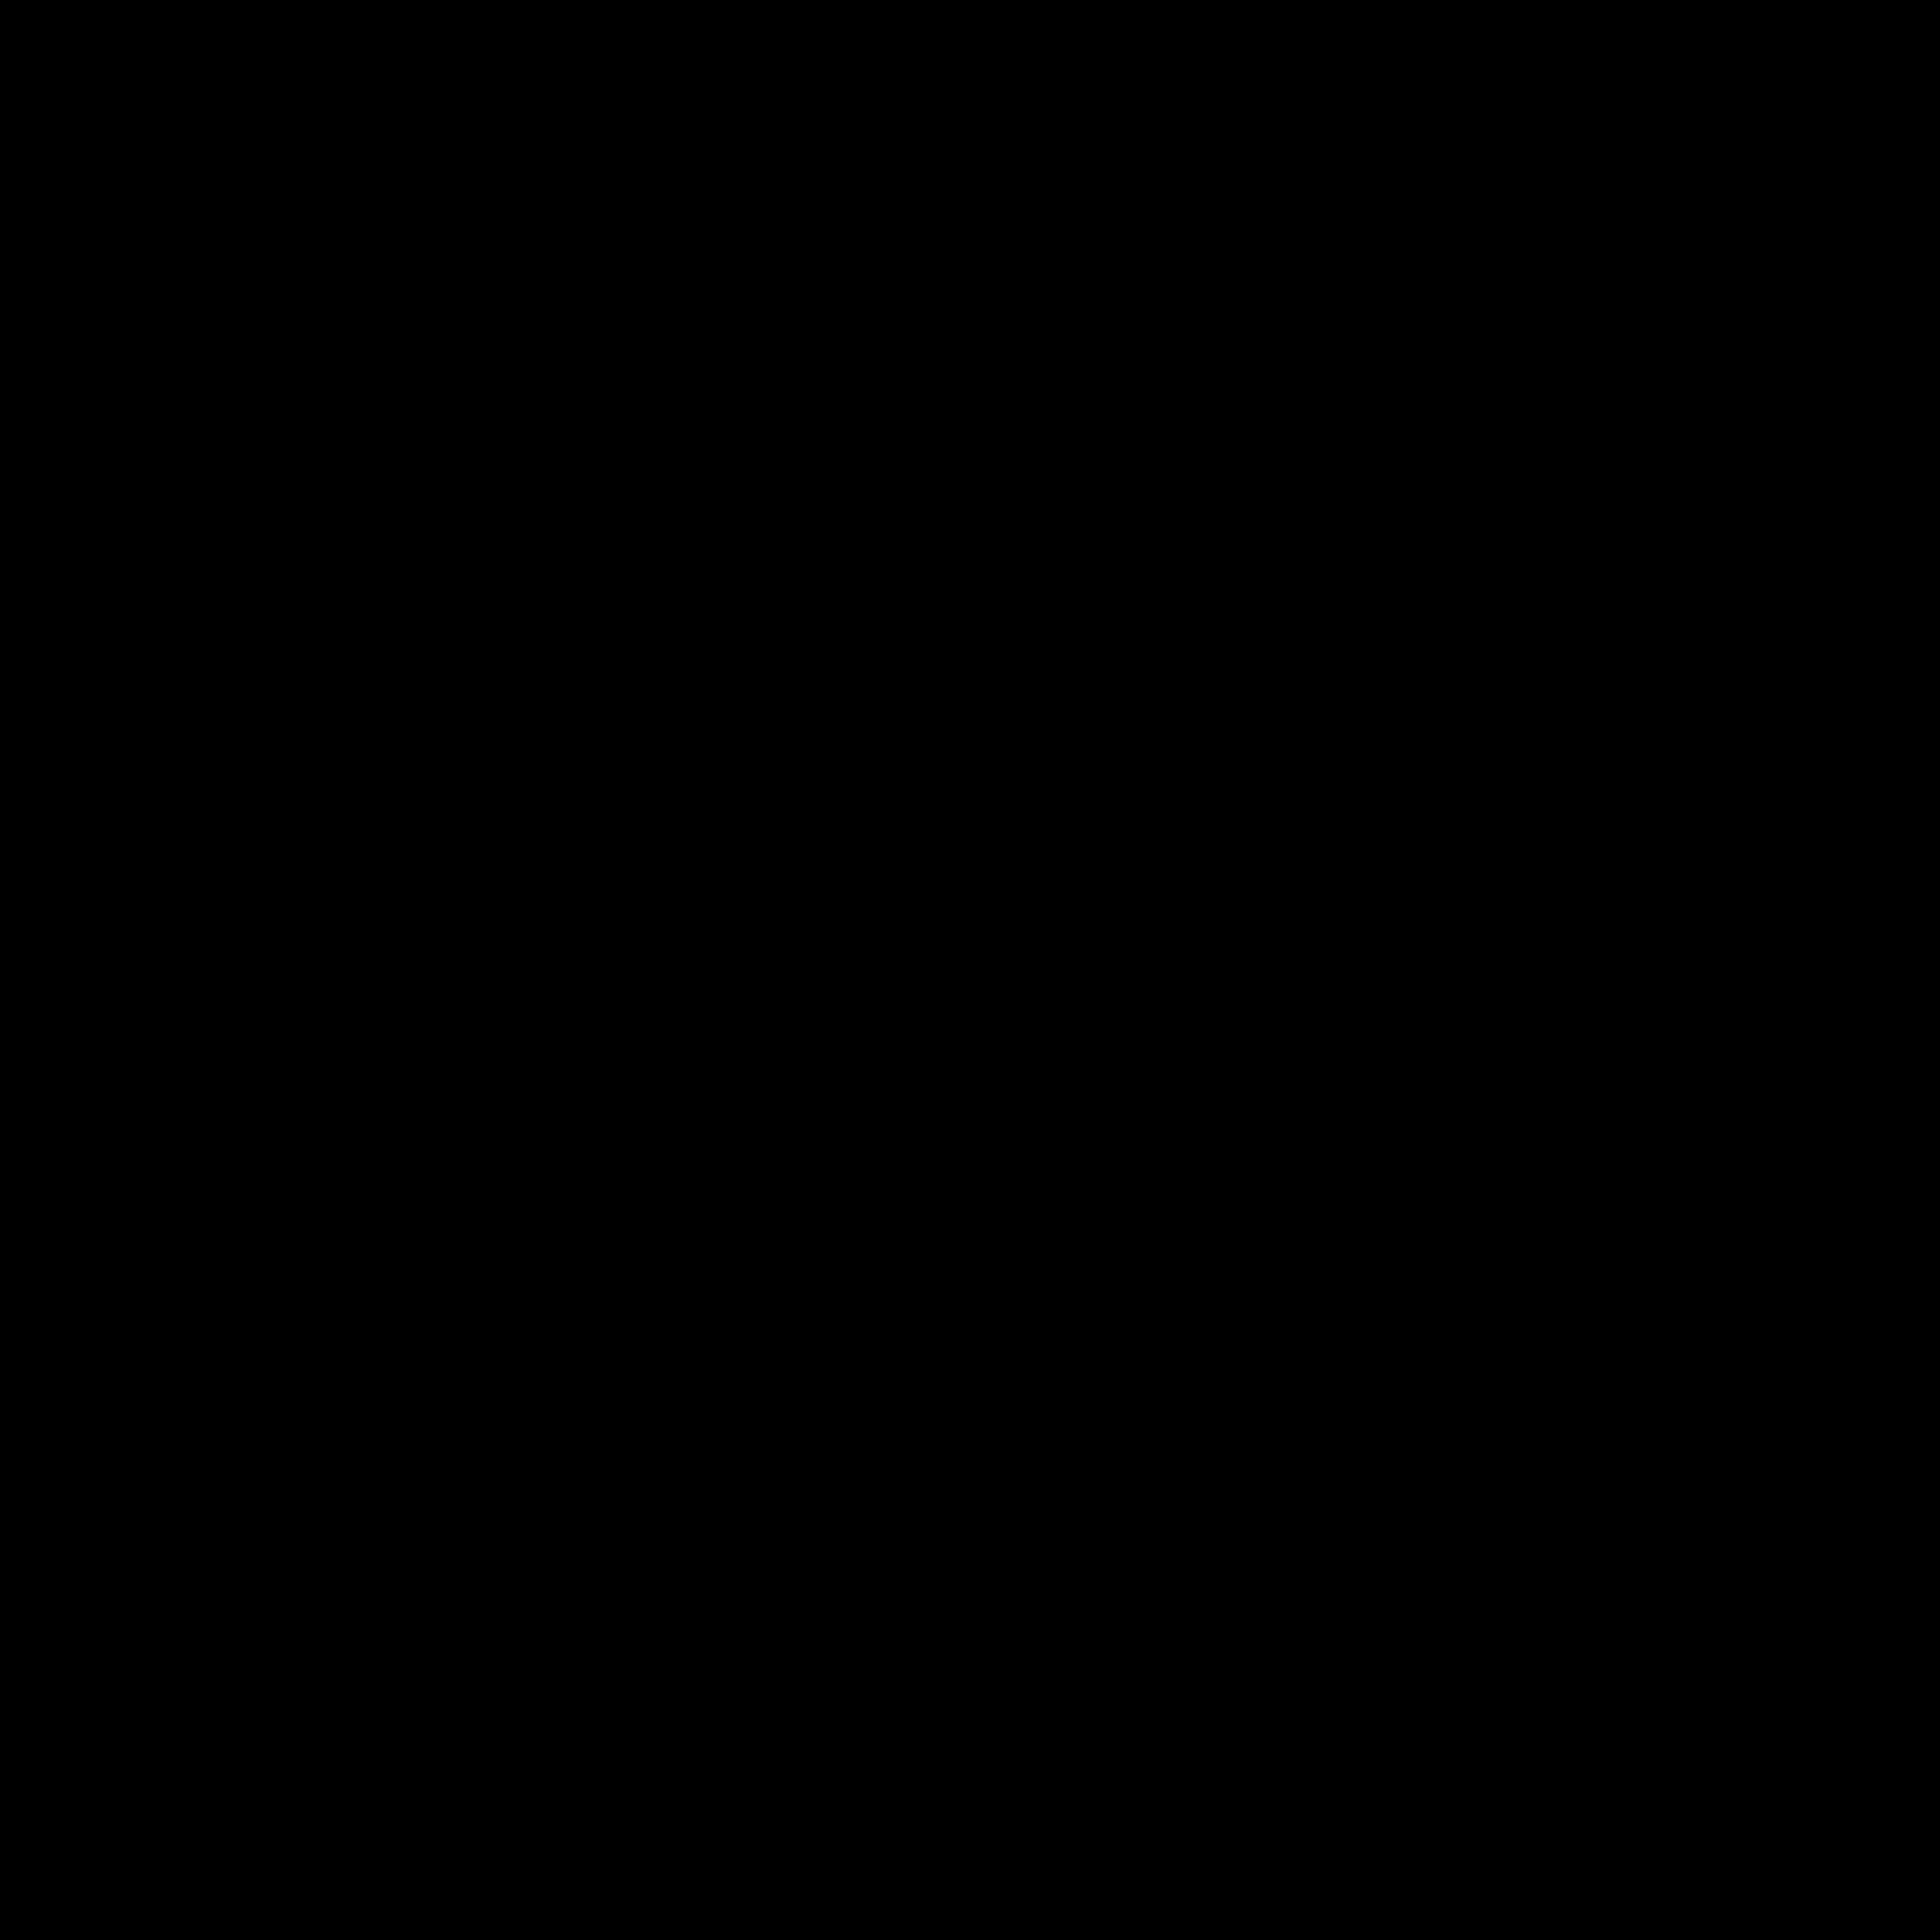 bloomberg-television-logo-png-transparent.png